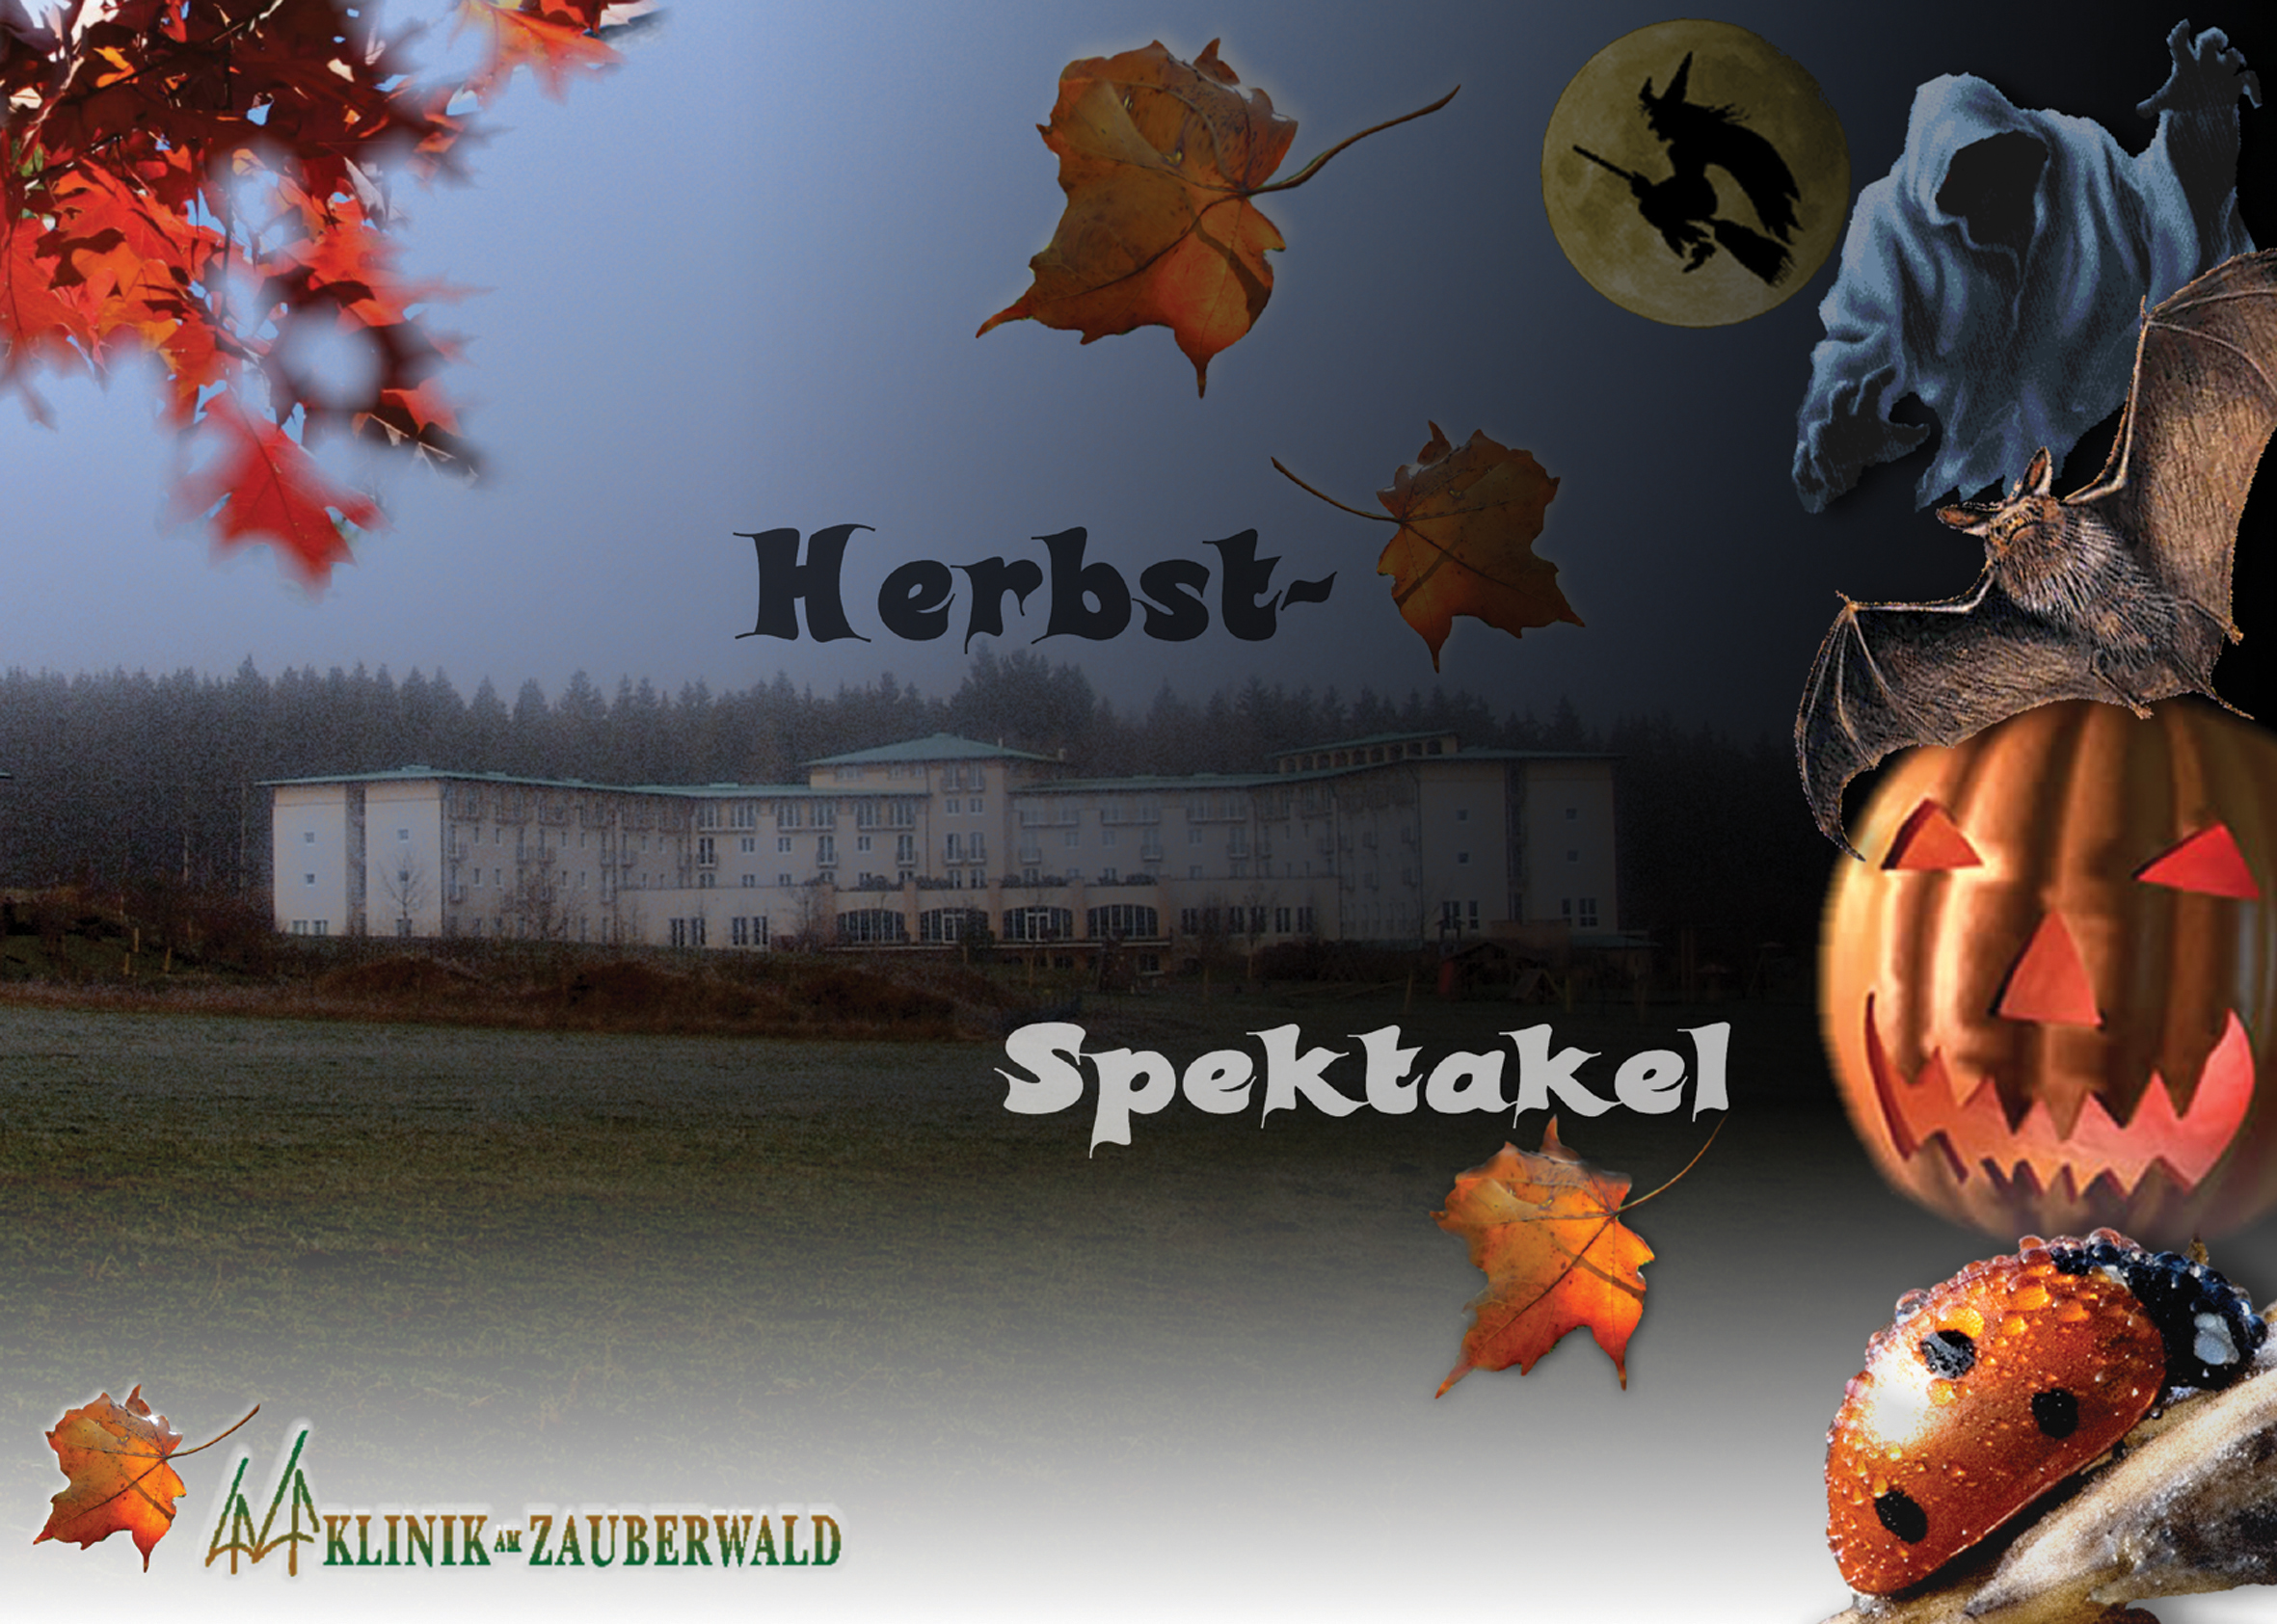 Herbst Postkarte a copy.jpg